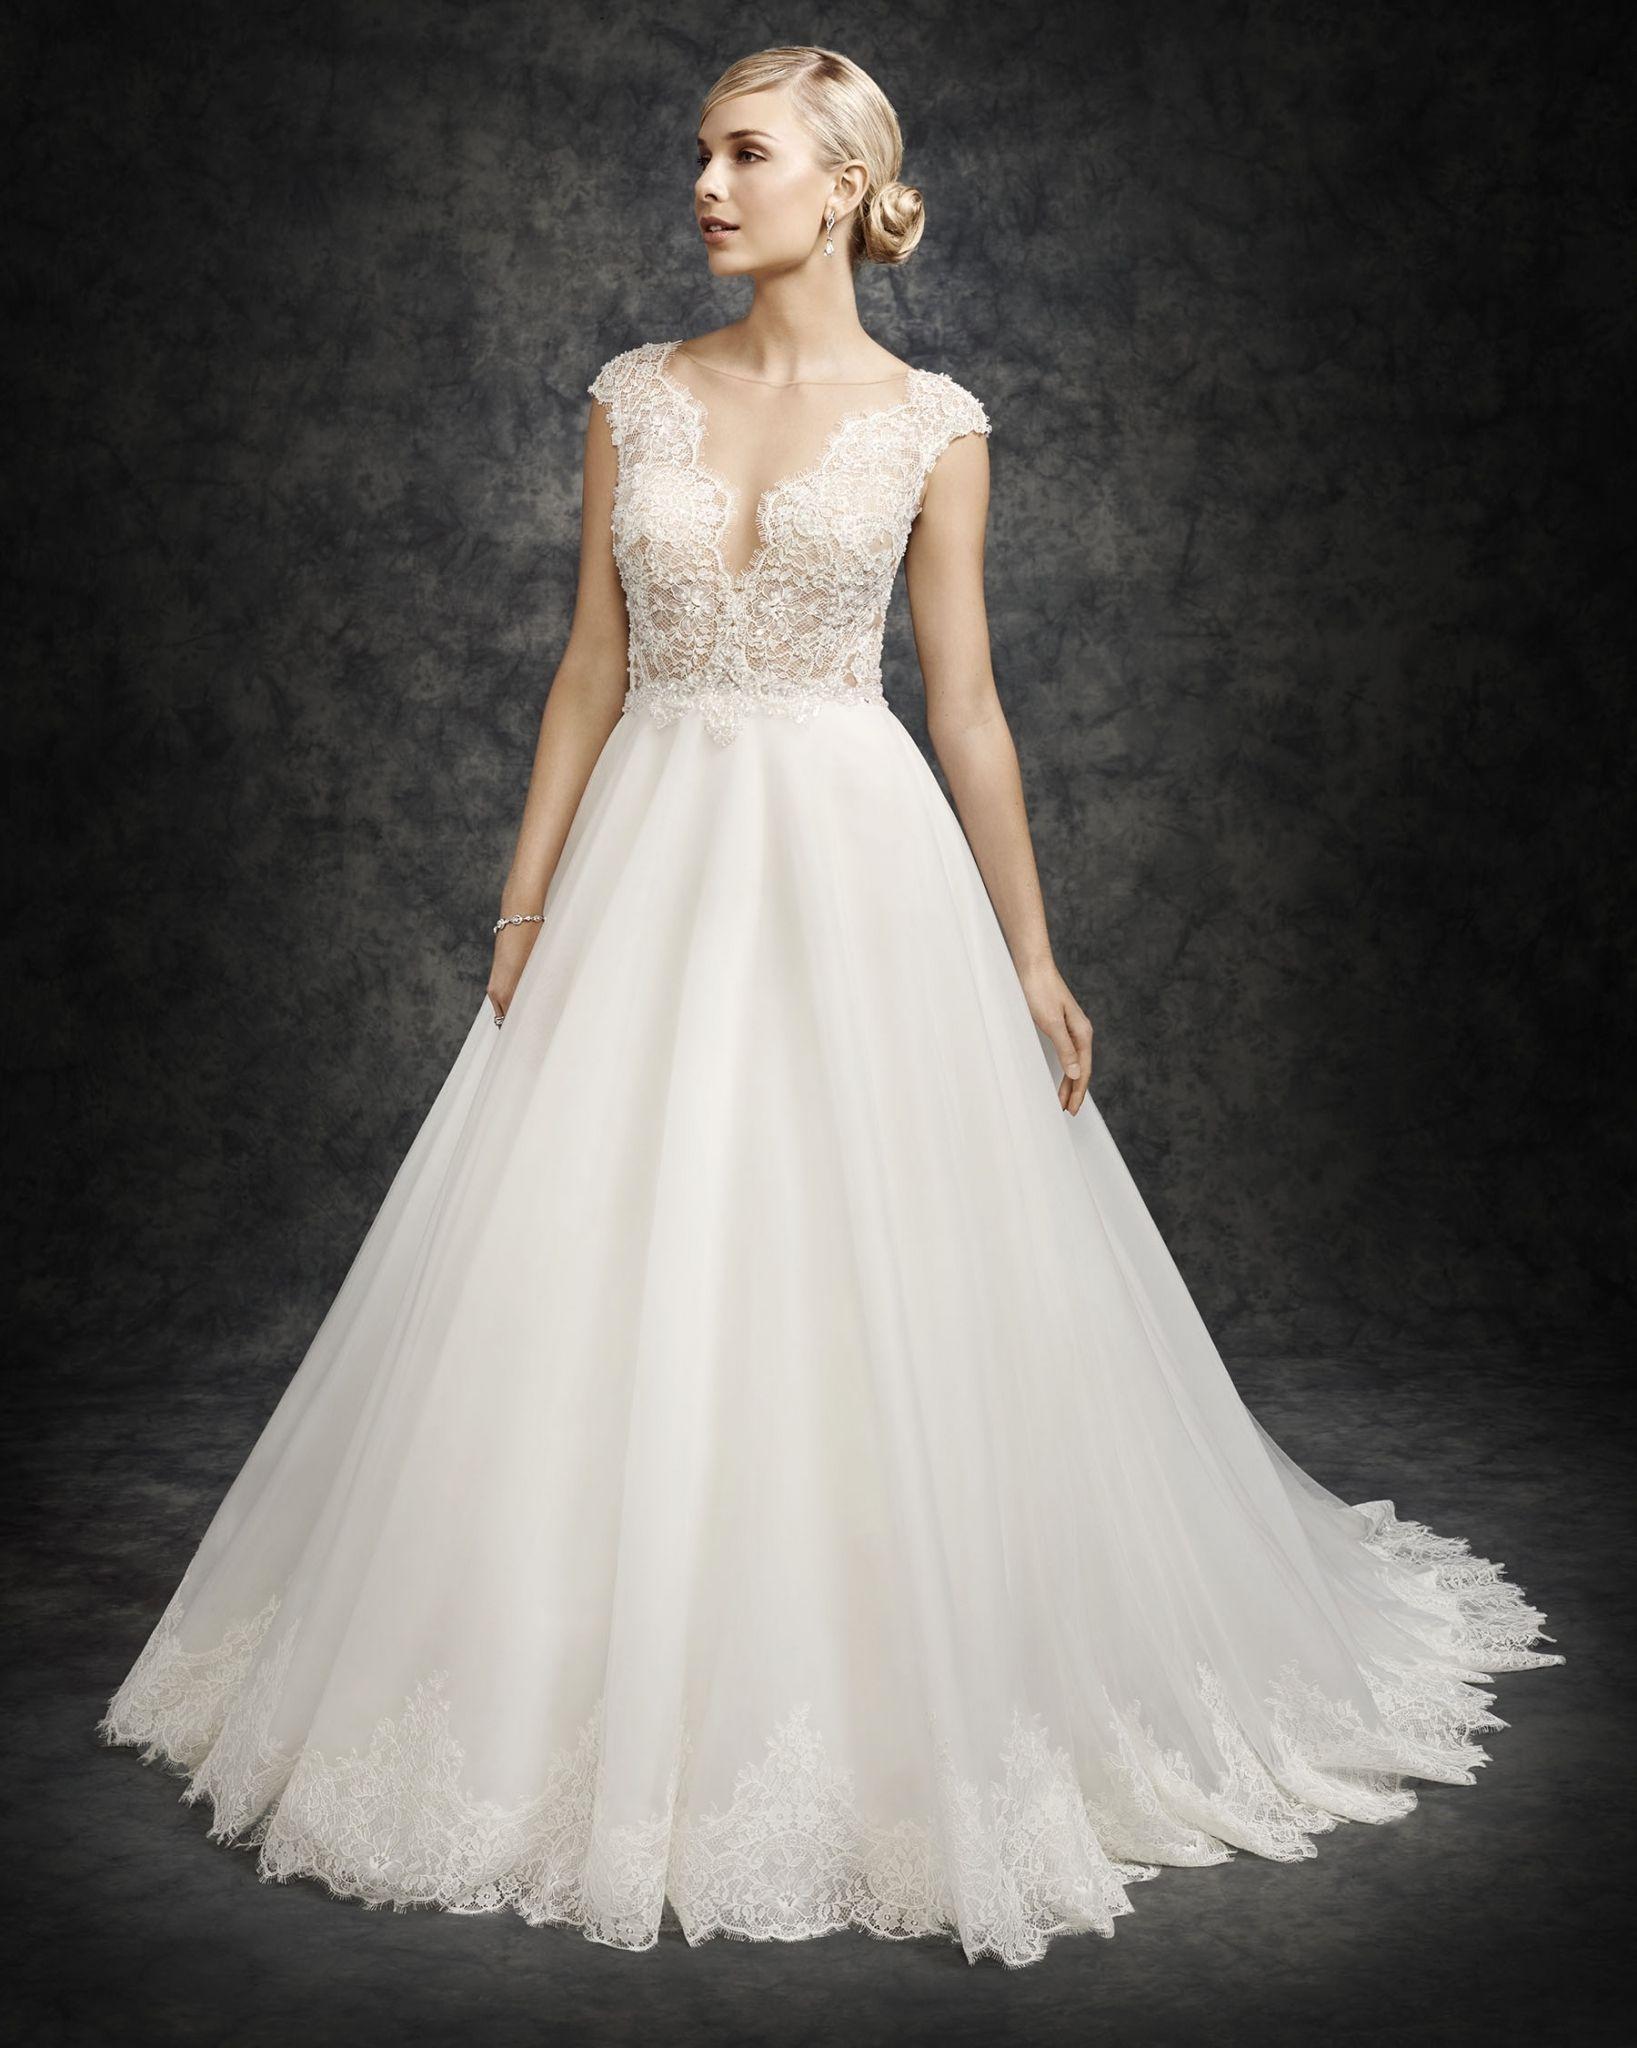 ella rosa wedding dress prices - wedding dresses for the mature ...